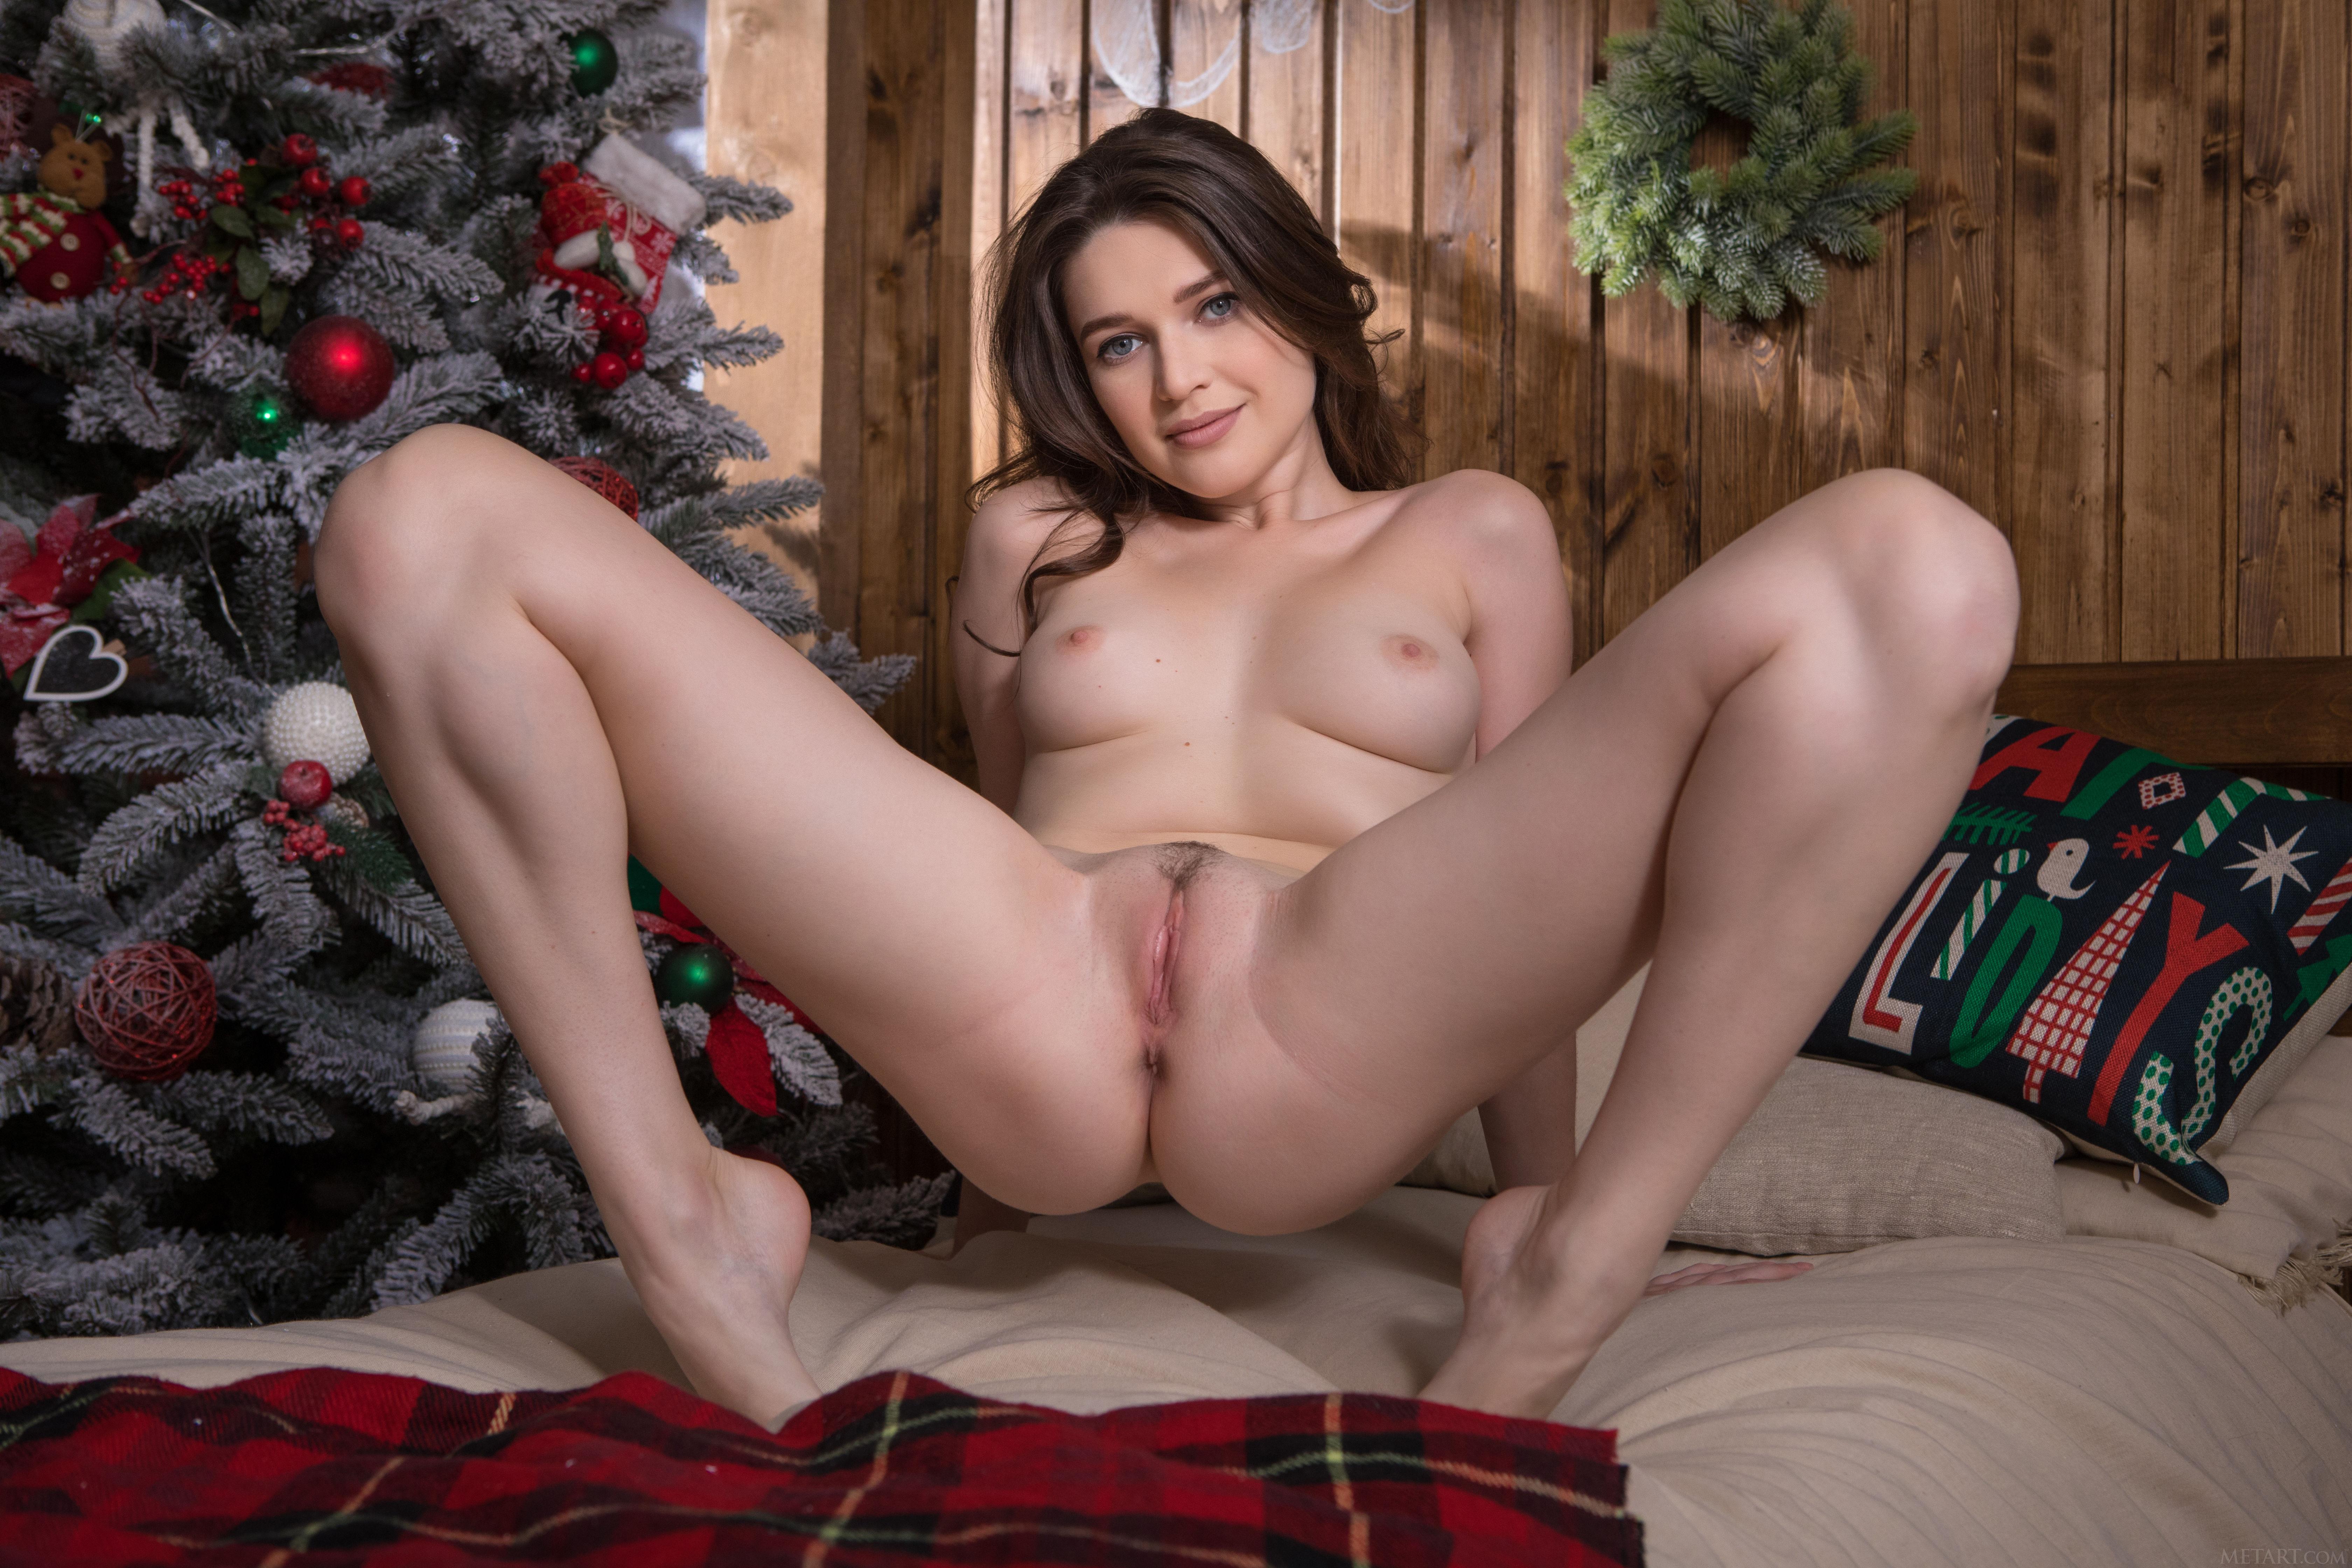 Rosario dawson naked fake